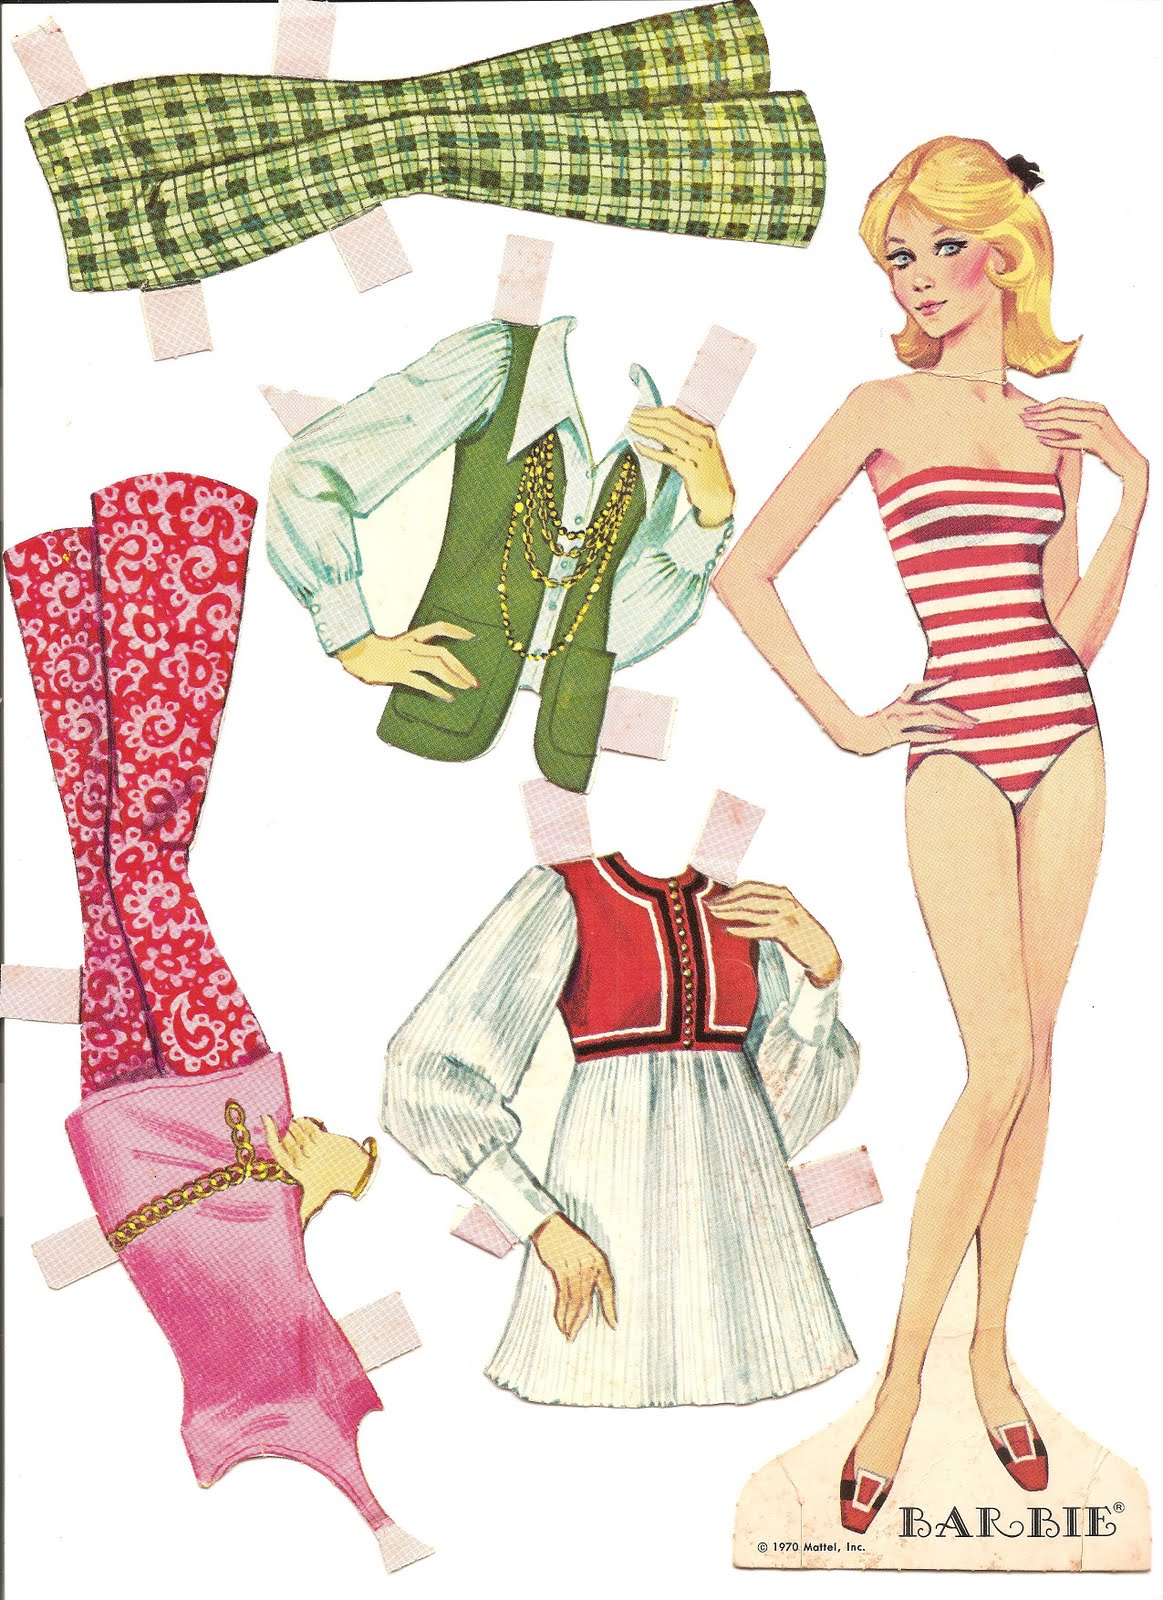 Ben noto Mostly Paper Dolls: My BARBIE Paper Dolls, 1970 & 1972 WD95